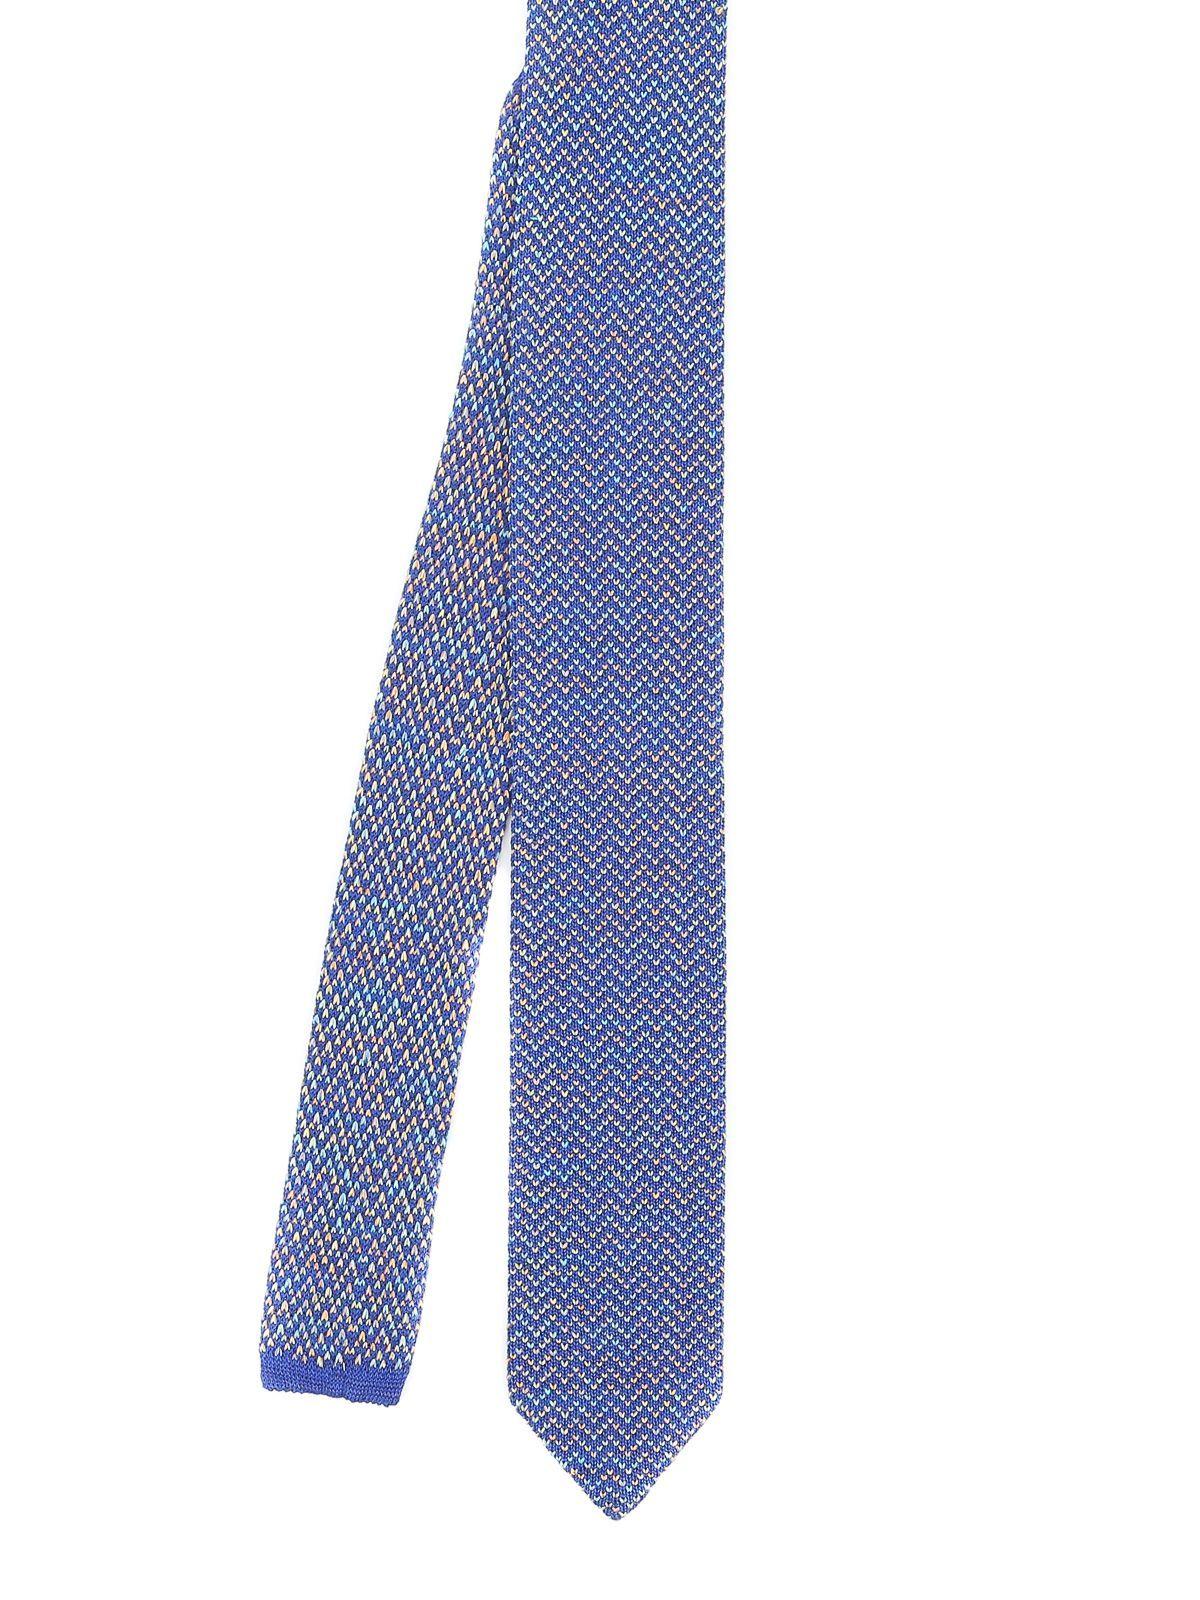 MISSONI MEN'S CR62CMU72932 LIGHT BLUE COTTON TIE